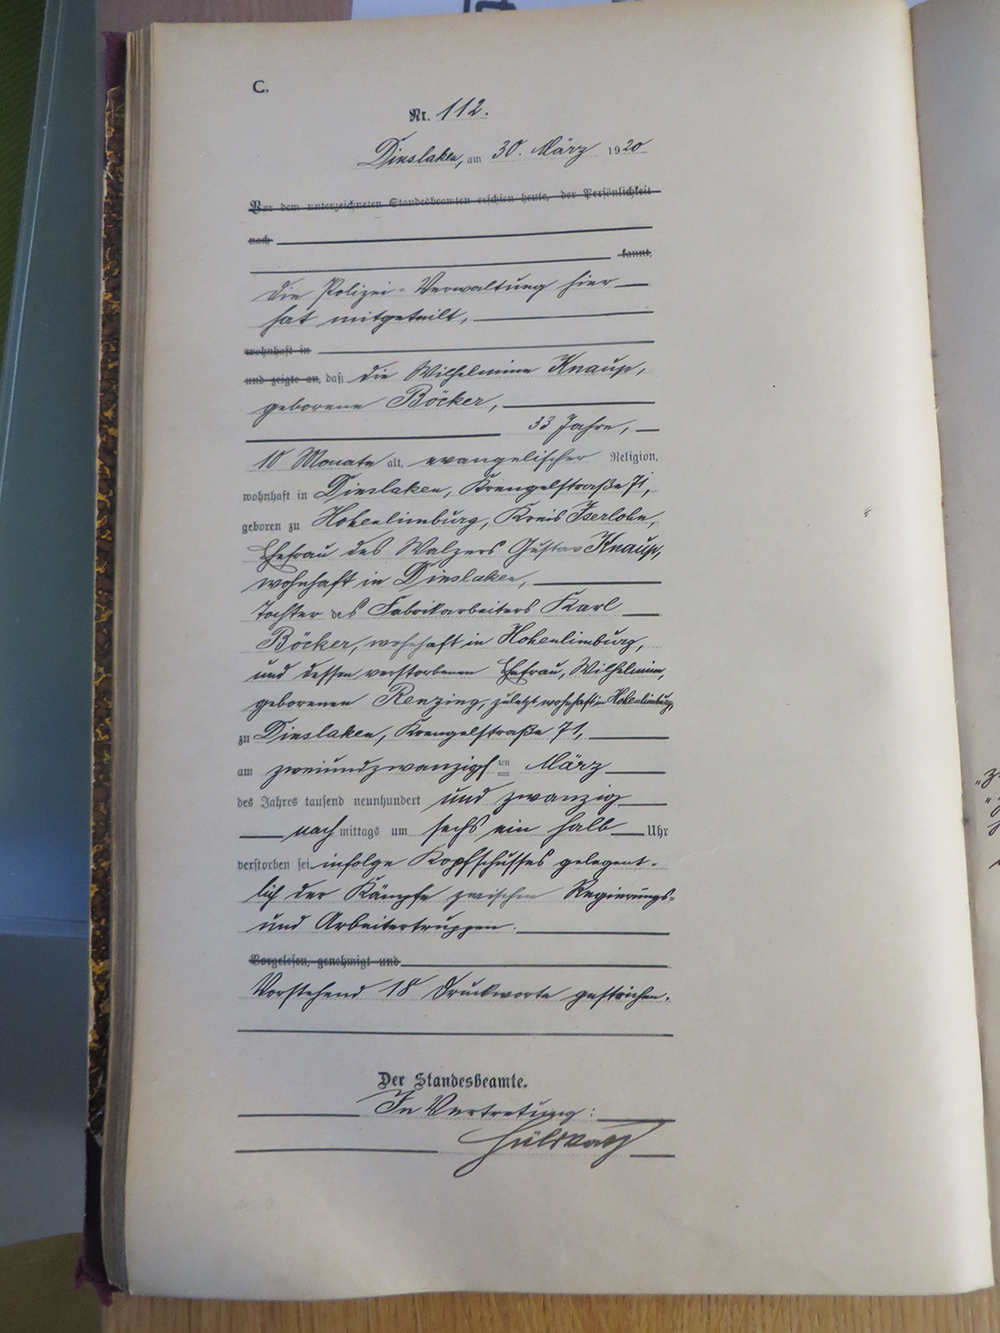 112.30.03.20. Wilhelmine Knaup, geb. Böcker in Hohenlimburg/Iserlohn (33)